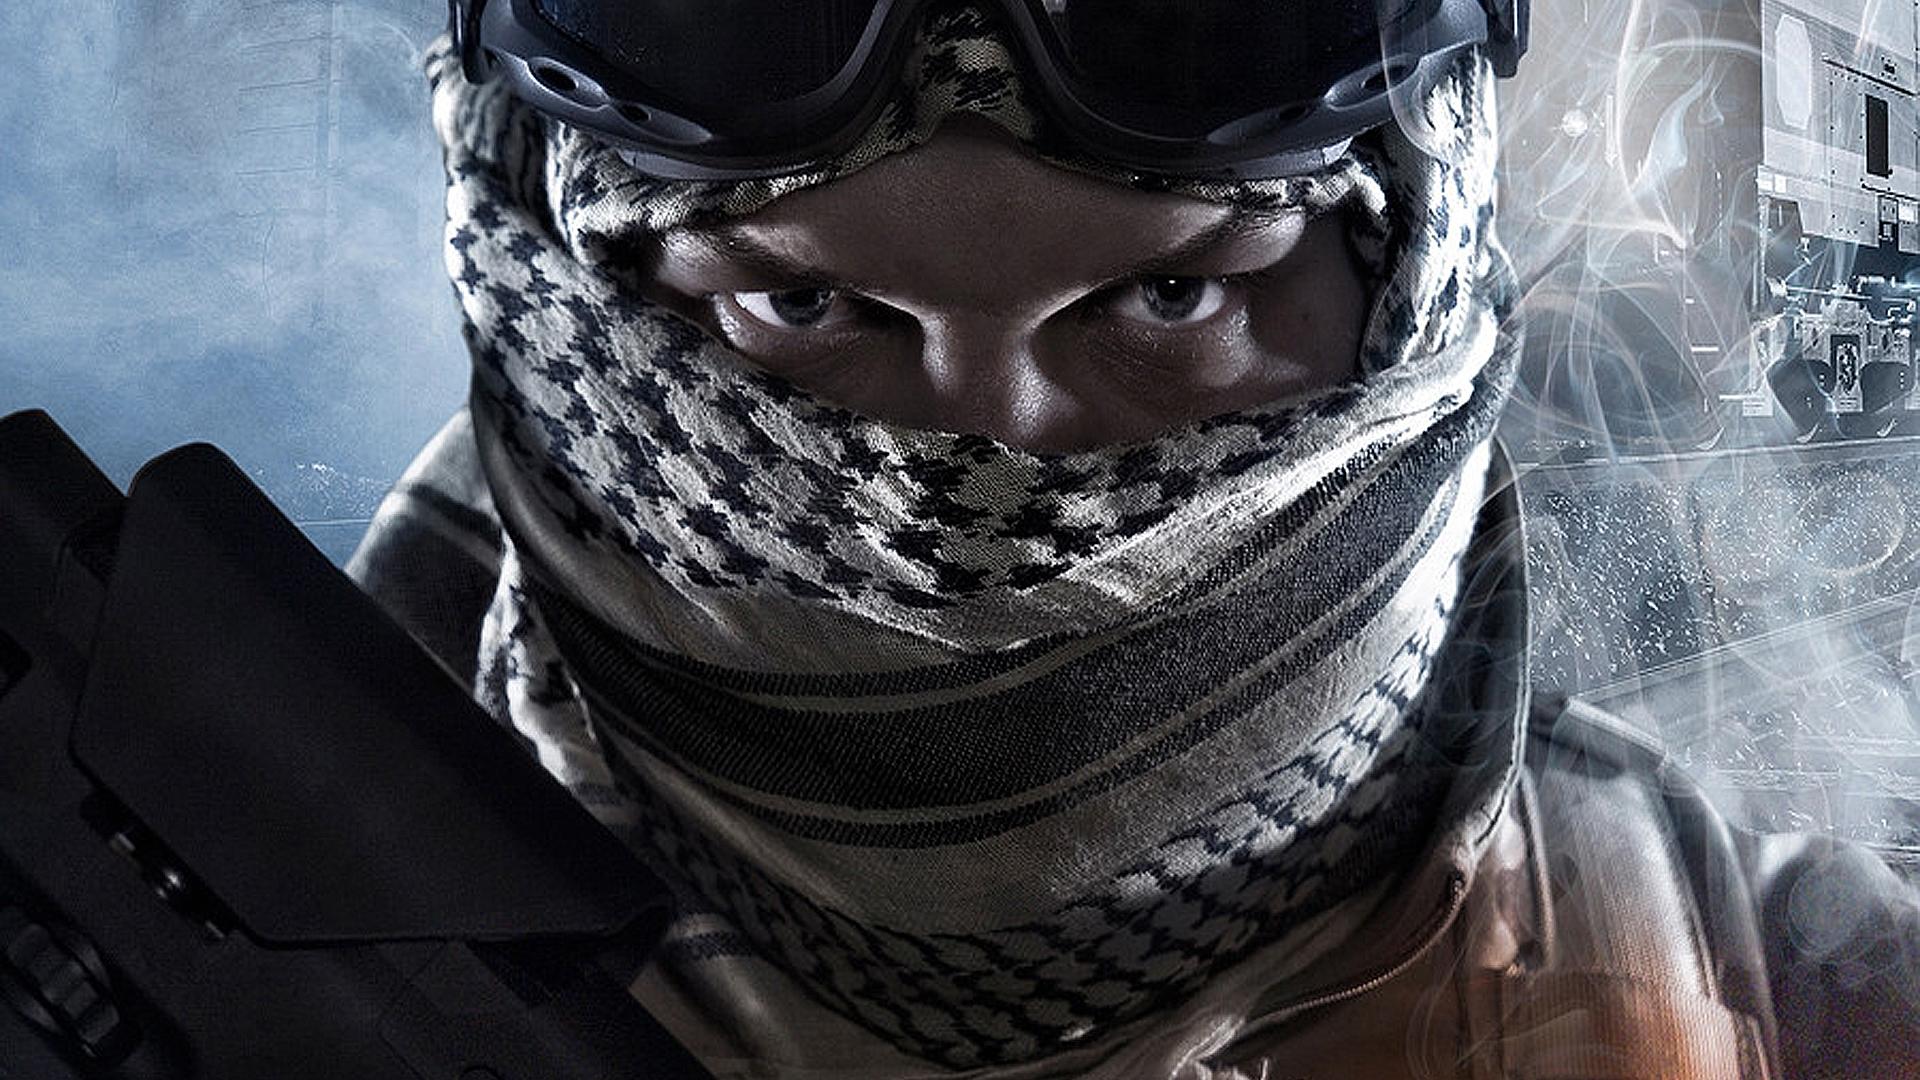 ... Wallpaper Abyss Everything Battlefield Video Game Battlefield 3 283388